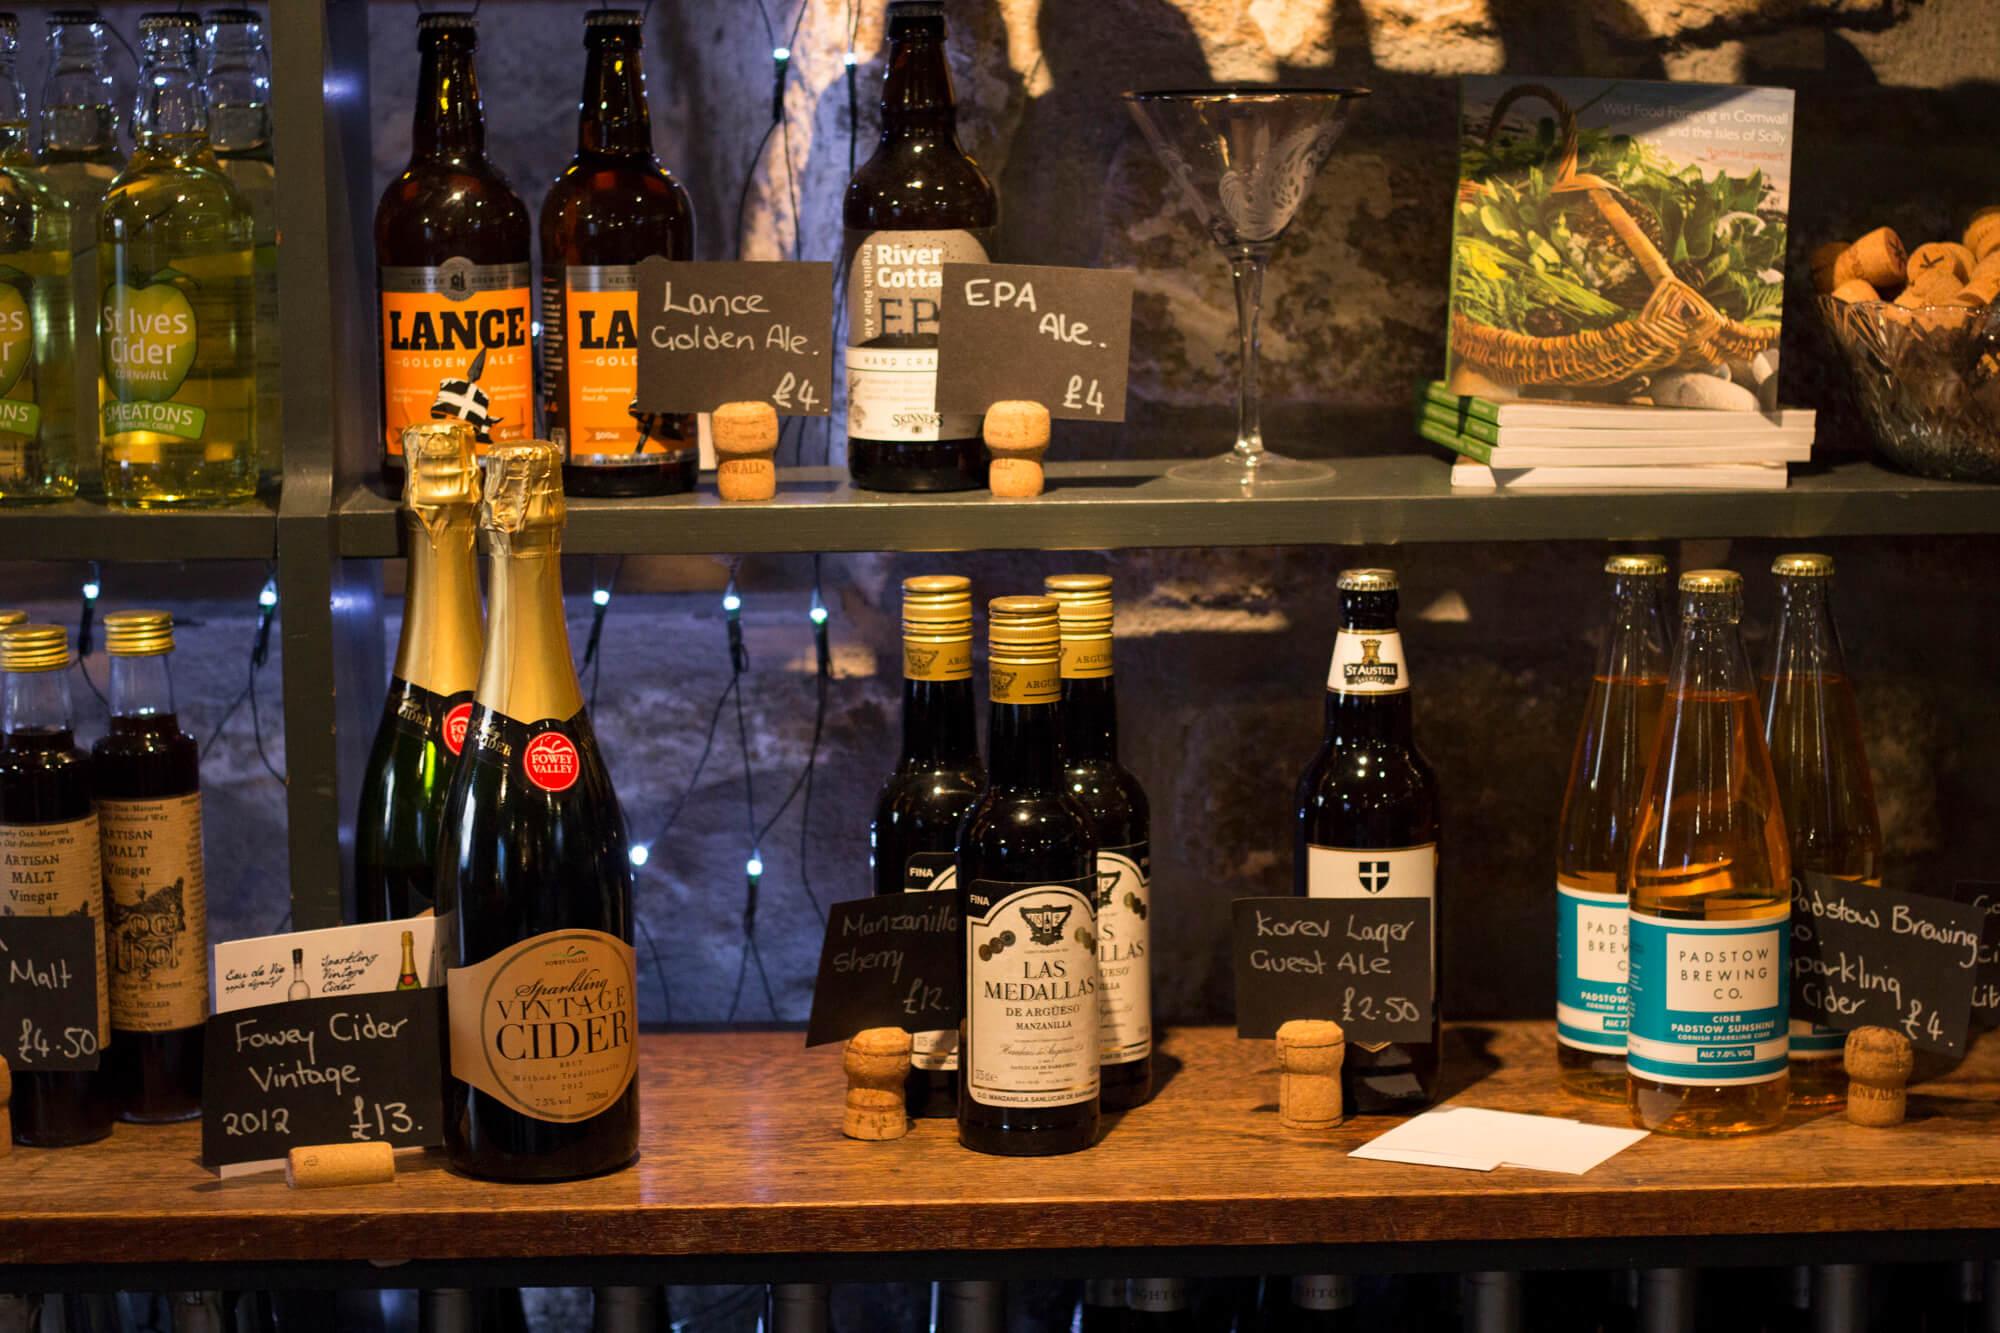 Feast Night at Knightor Winery